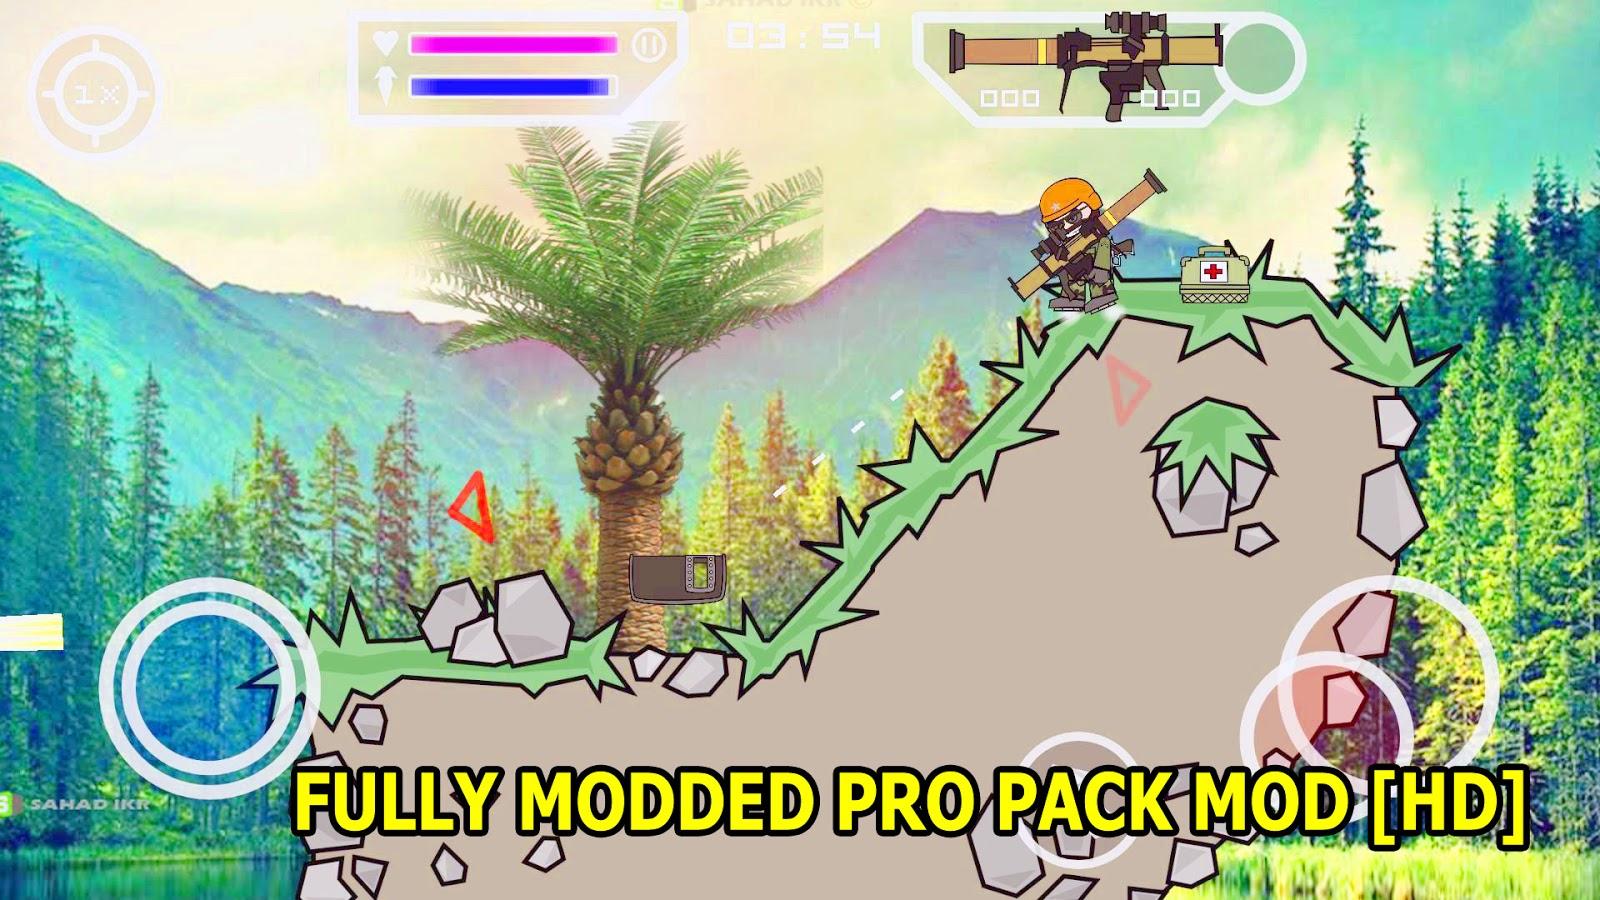 Download Mini militia pro pack files - TraDownload